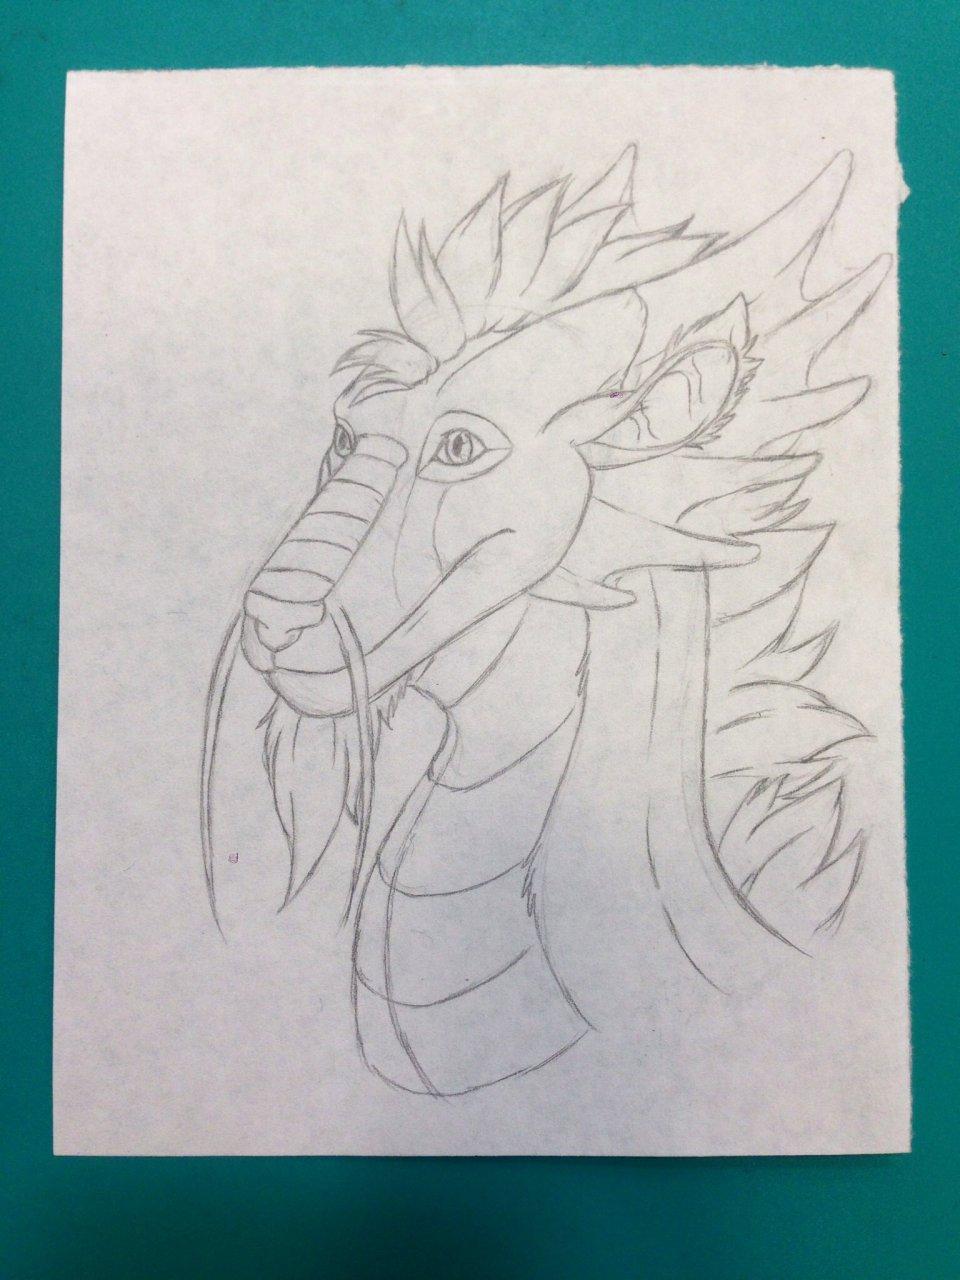 Dragon head: 3/4 view (Pencil)